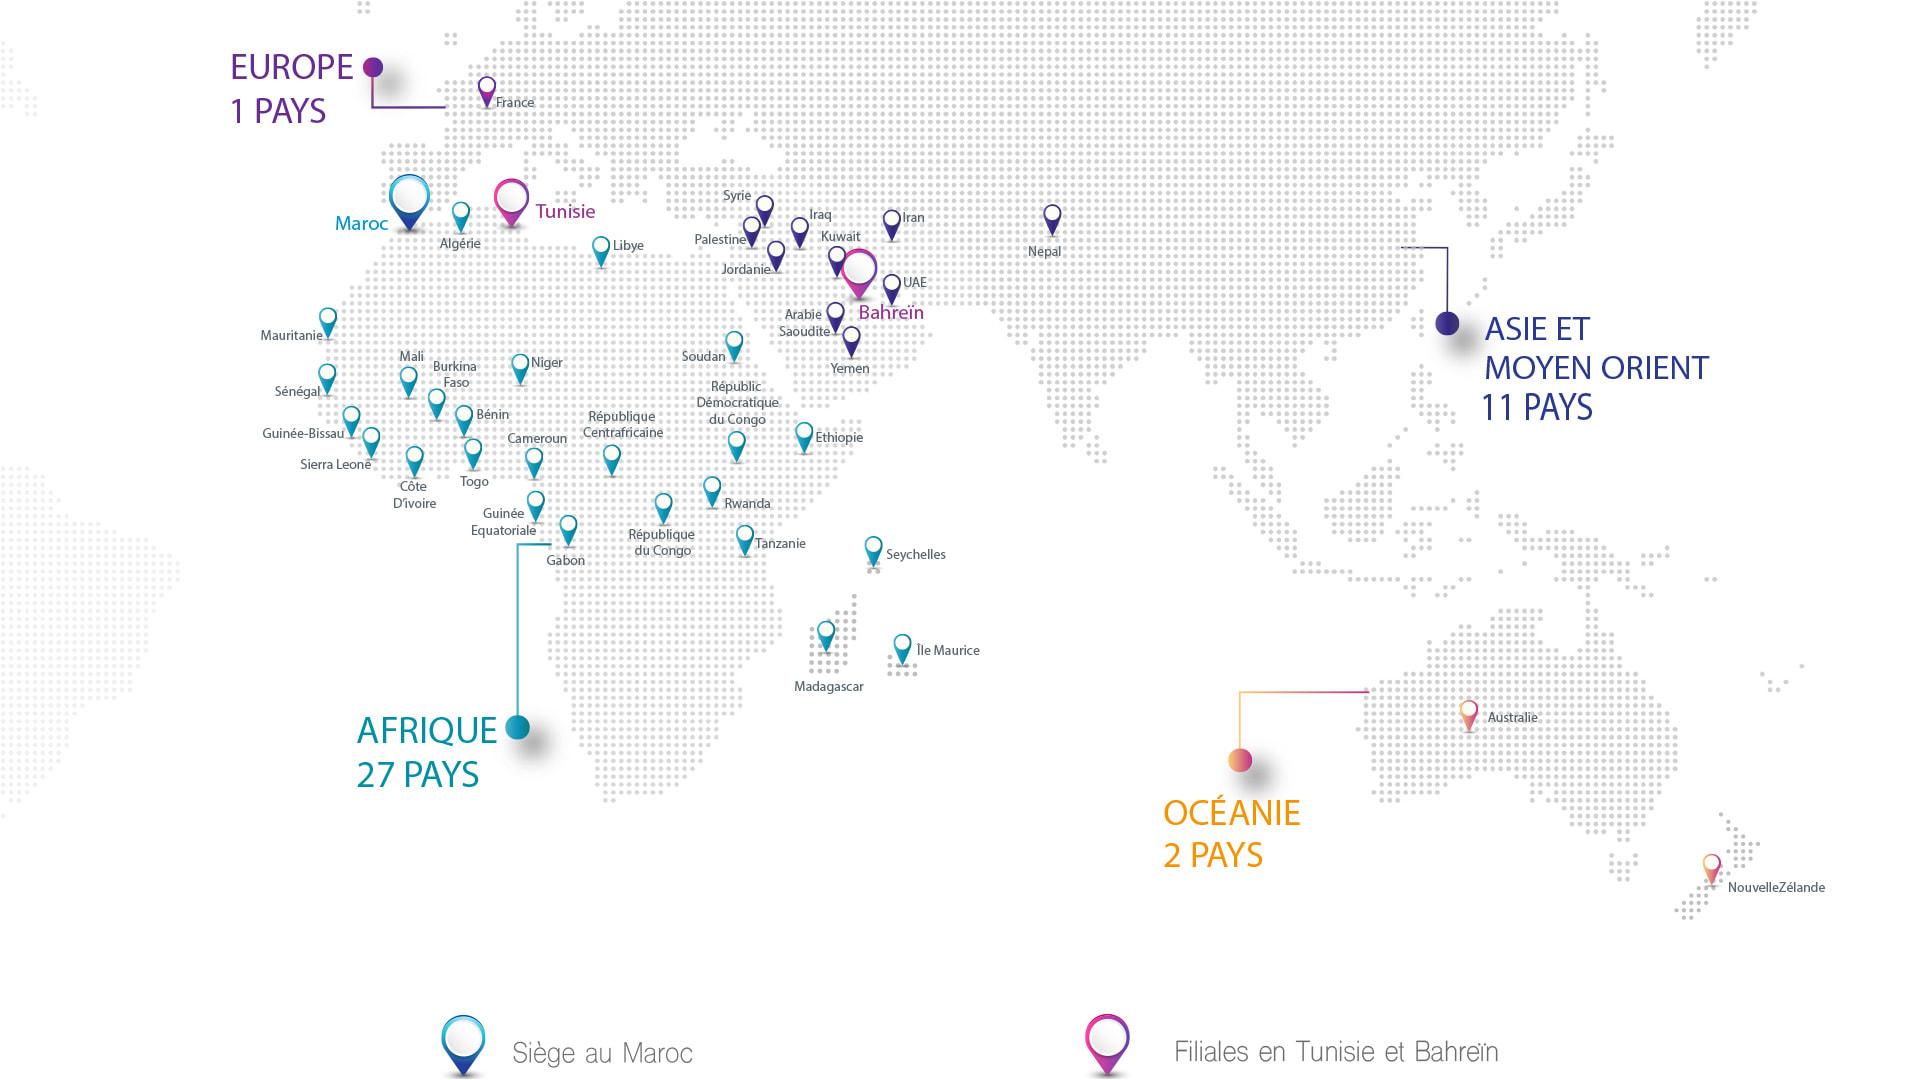 180 institutions around the world